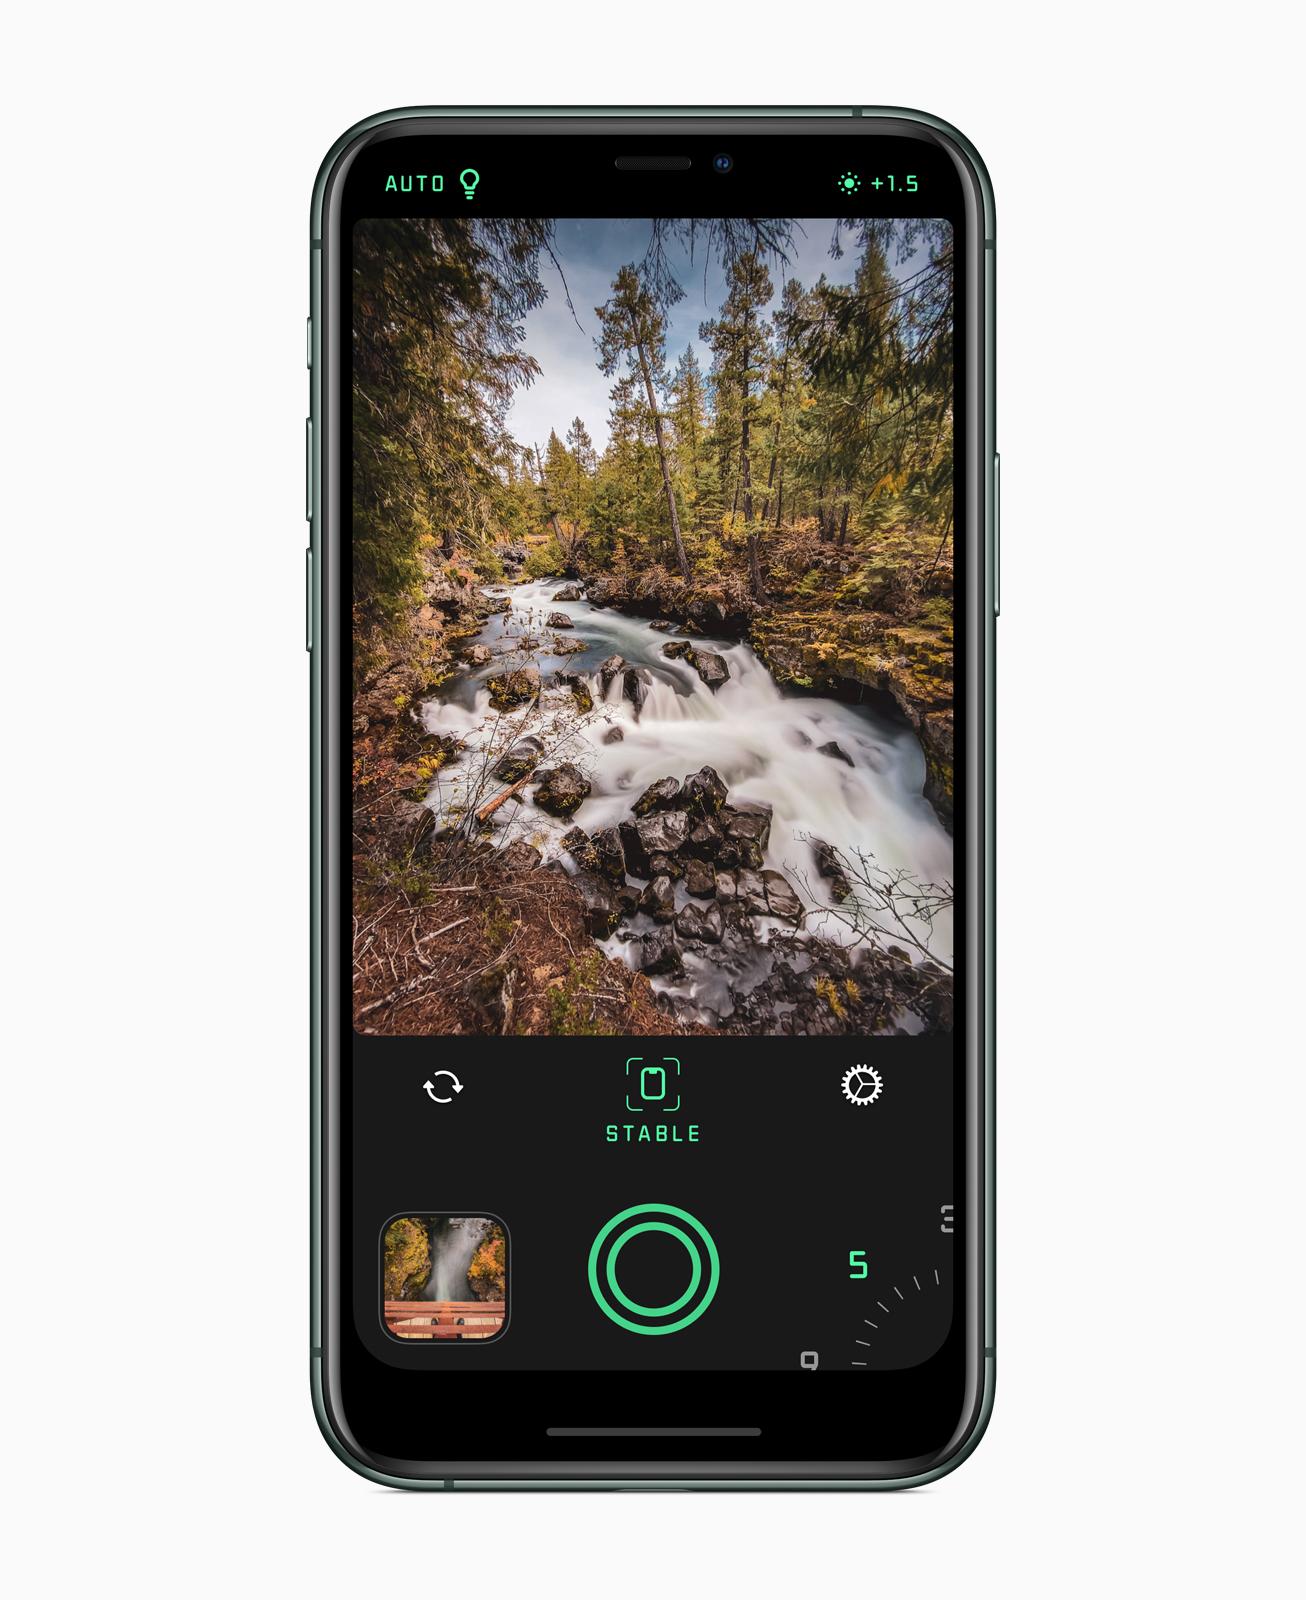 Apple Best of 2019 Spectre Camera 2019